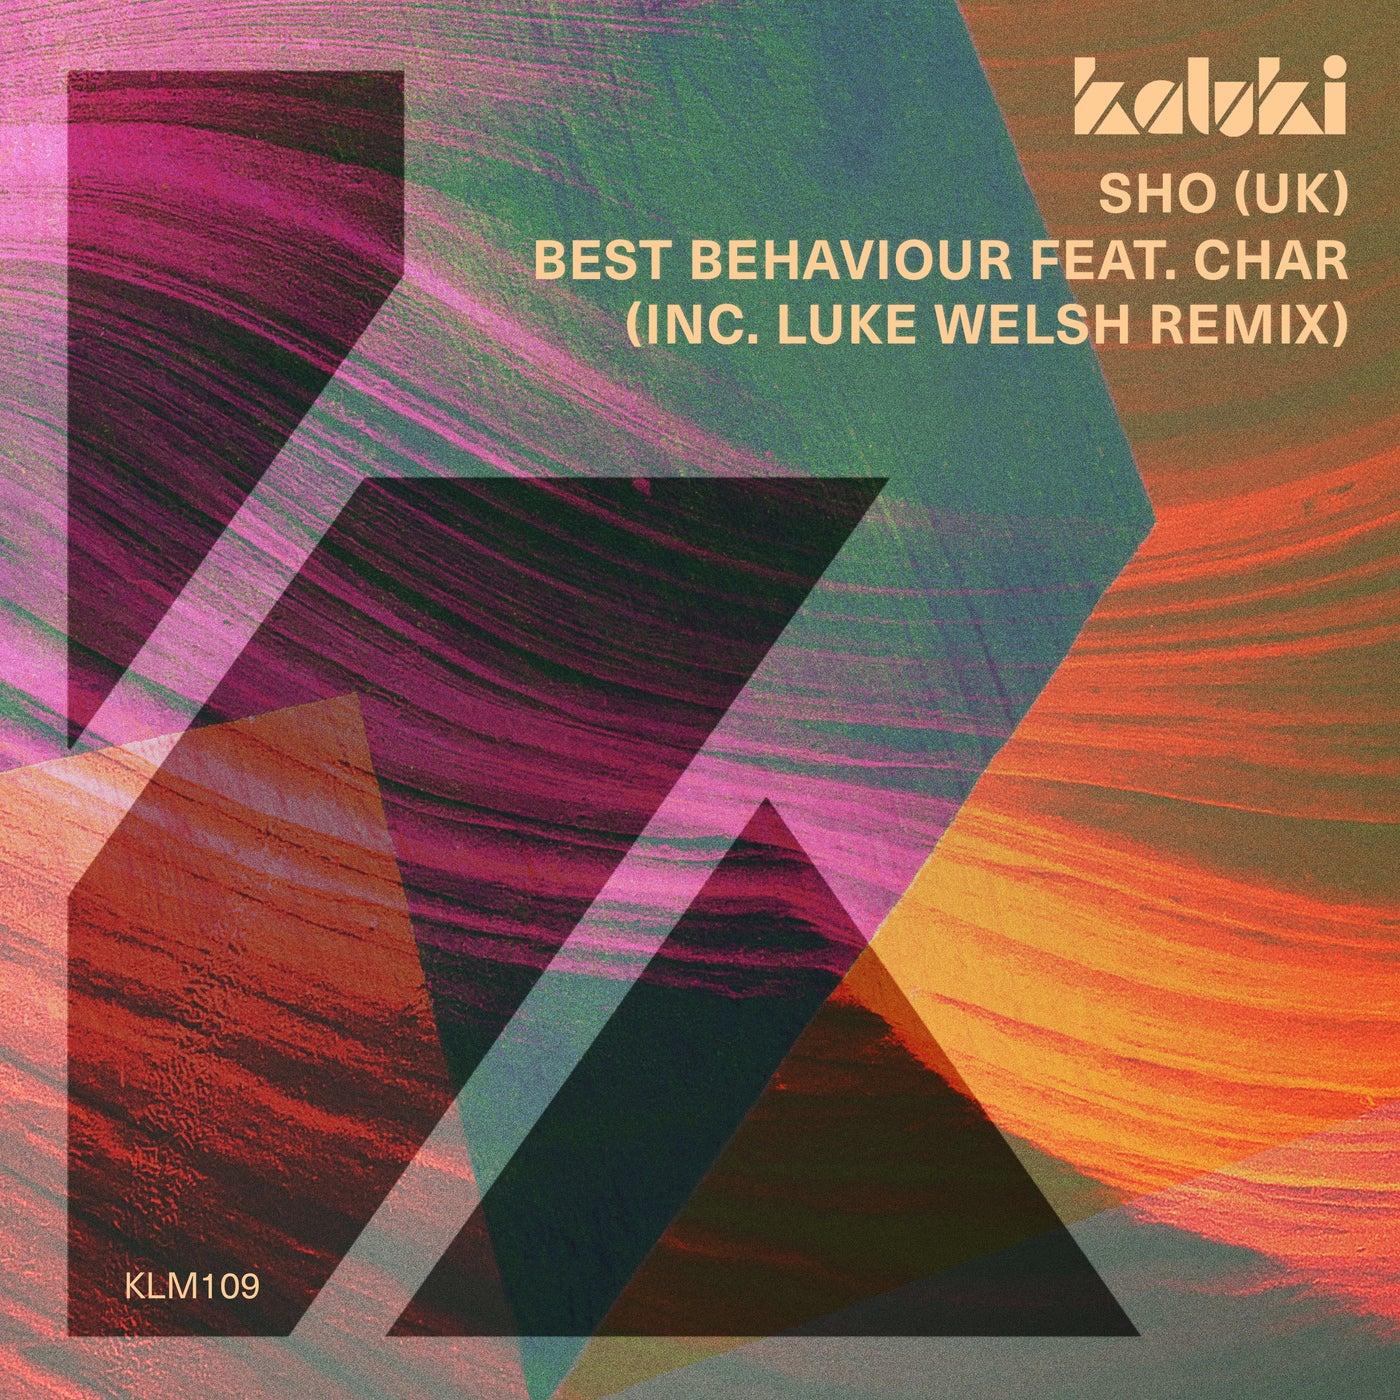 Best Behaviour (feat. CHAR) (Extended Mix)